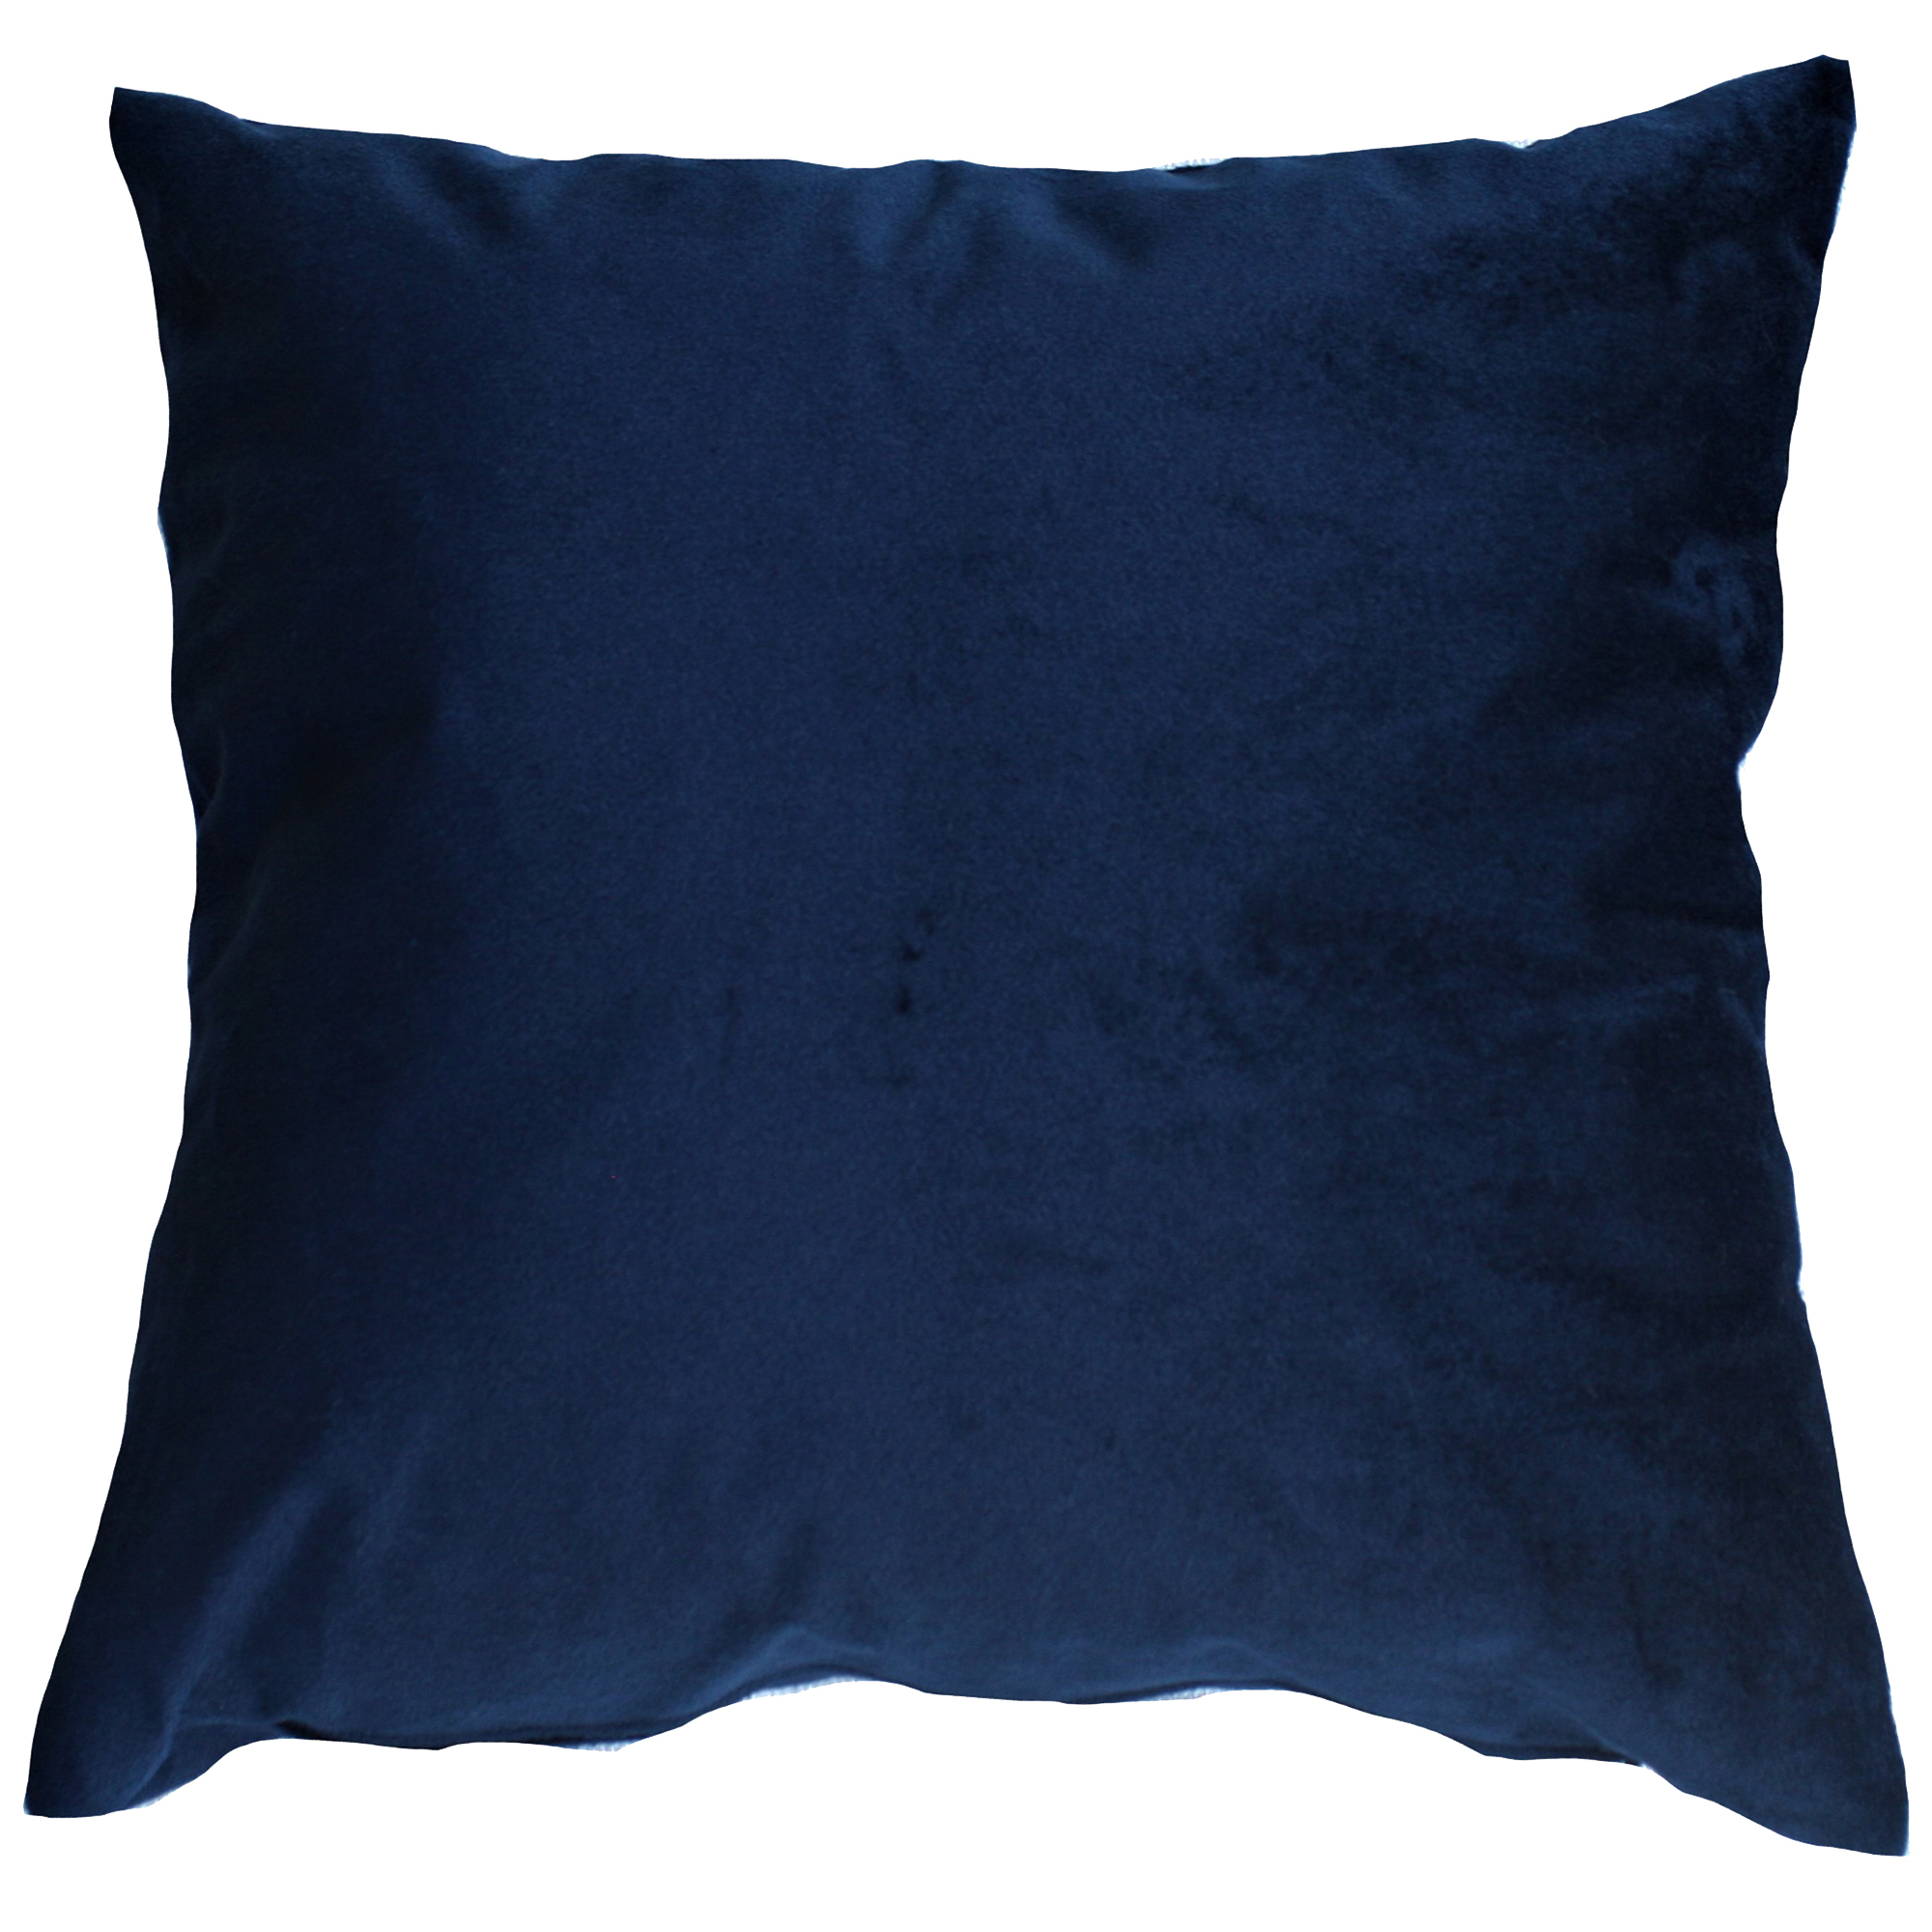 Bungalow Living Navy Blue Velvet Cushion Temple Webster